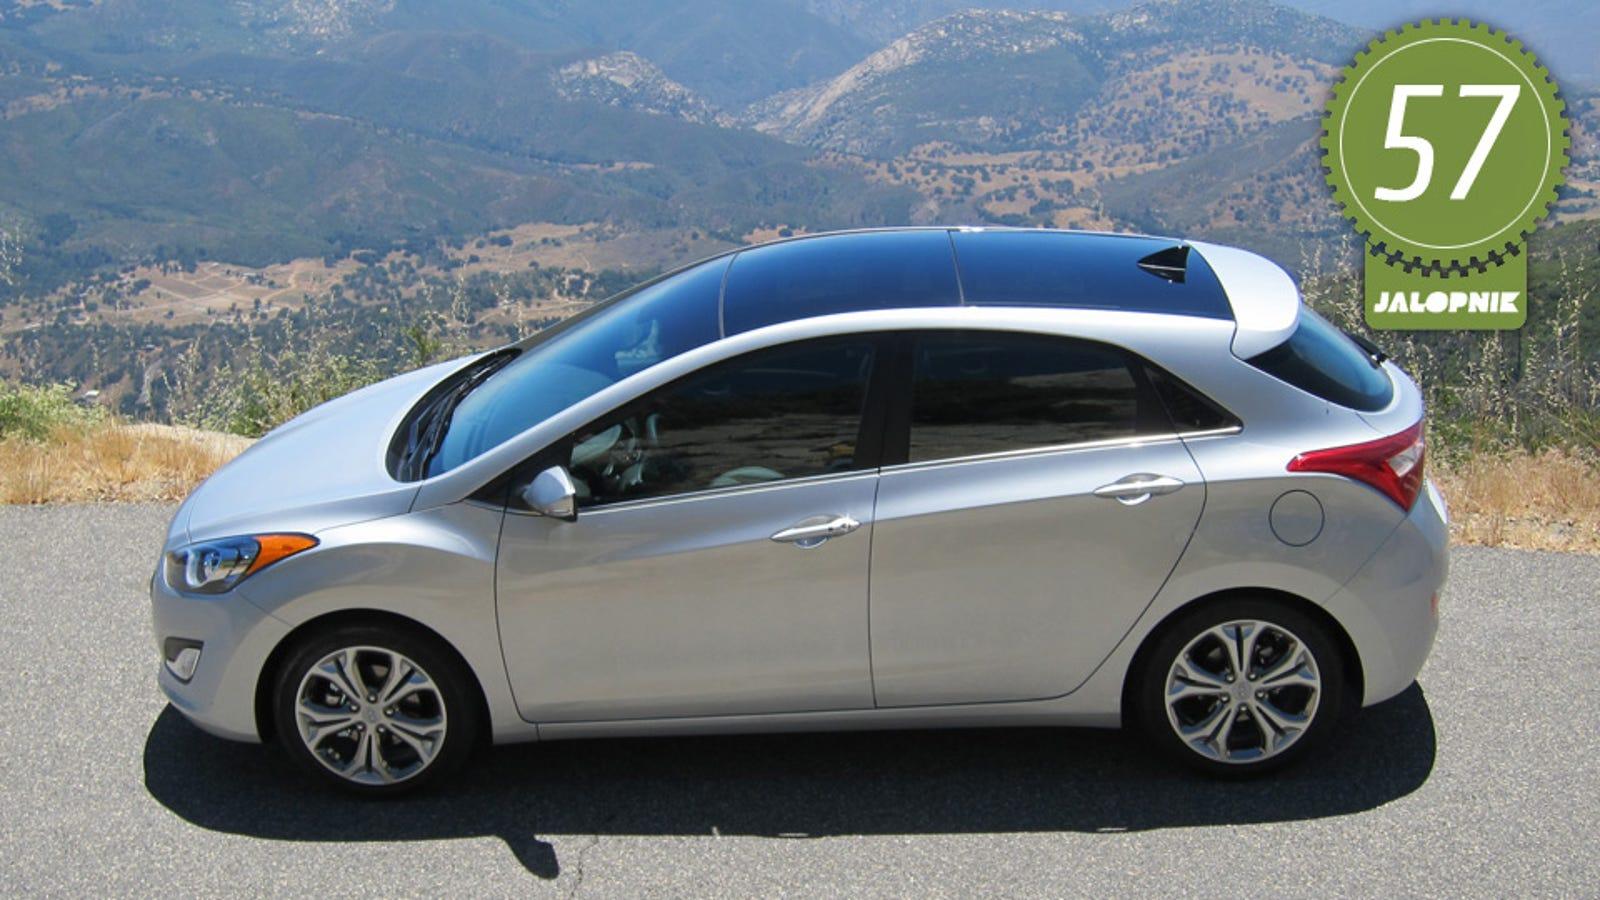 2013 Hyundai Elantra Gt The Jalopnik Review